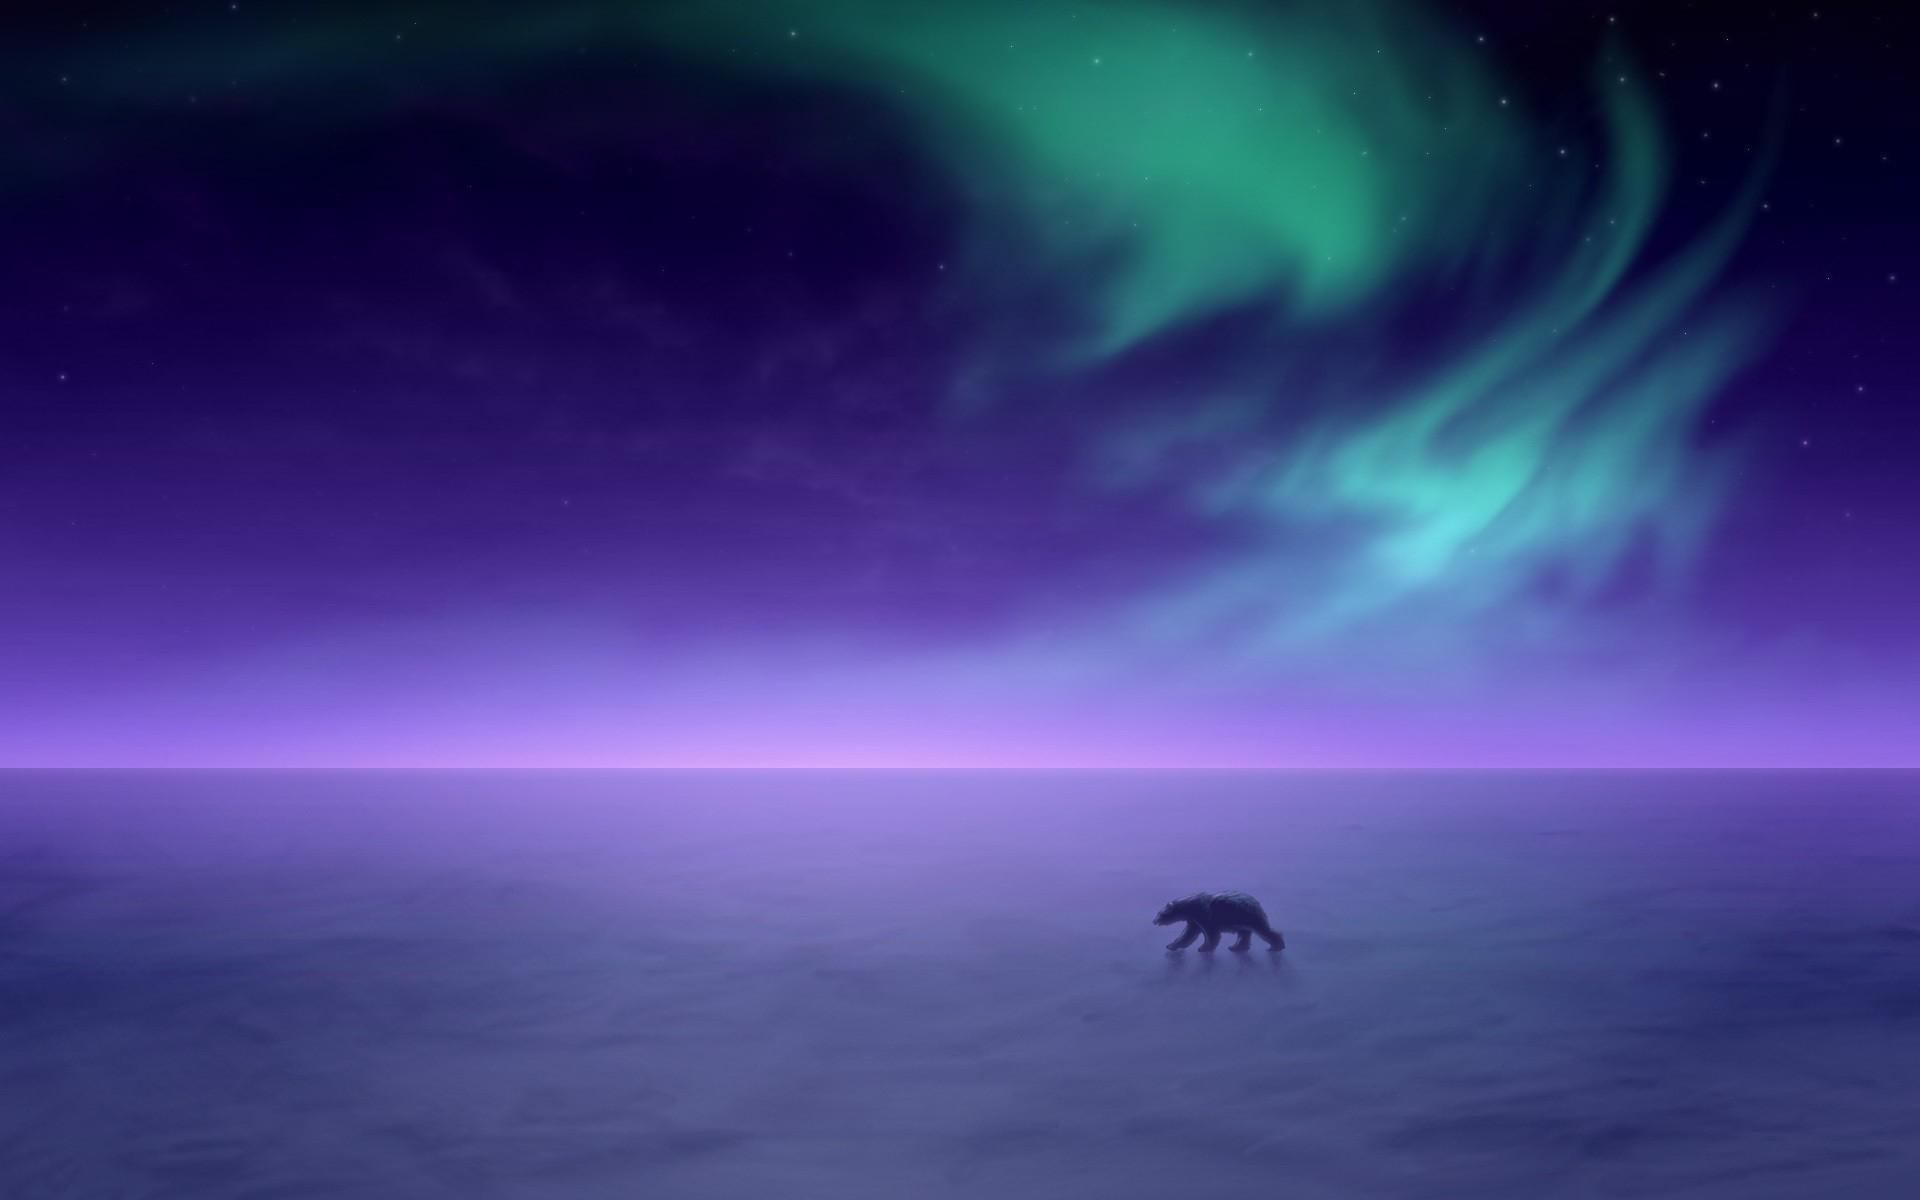 purple aurora borealis wallpapers x - photo #15